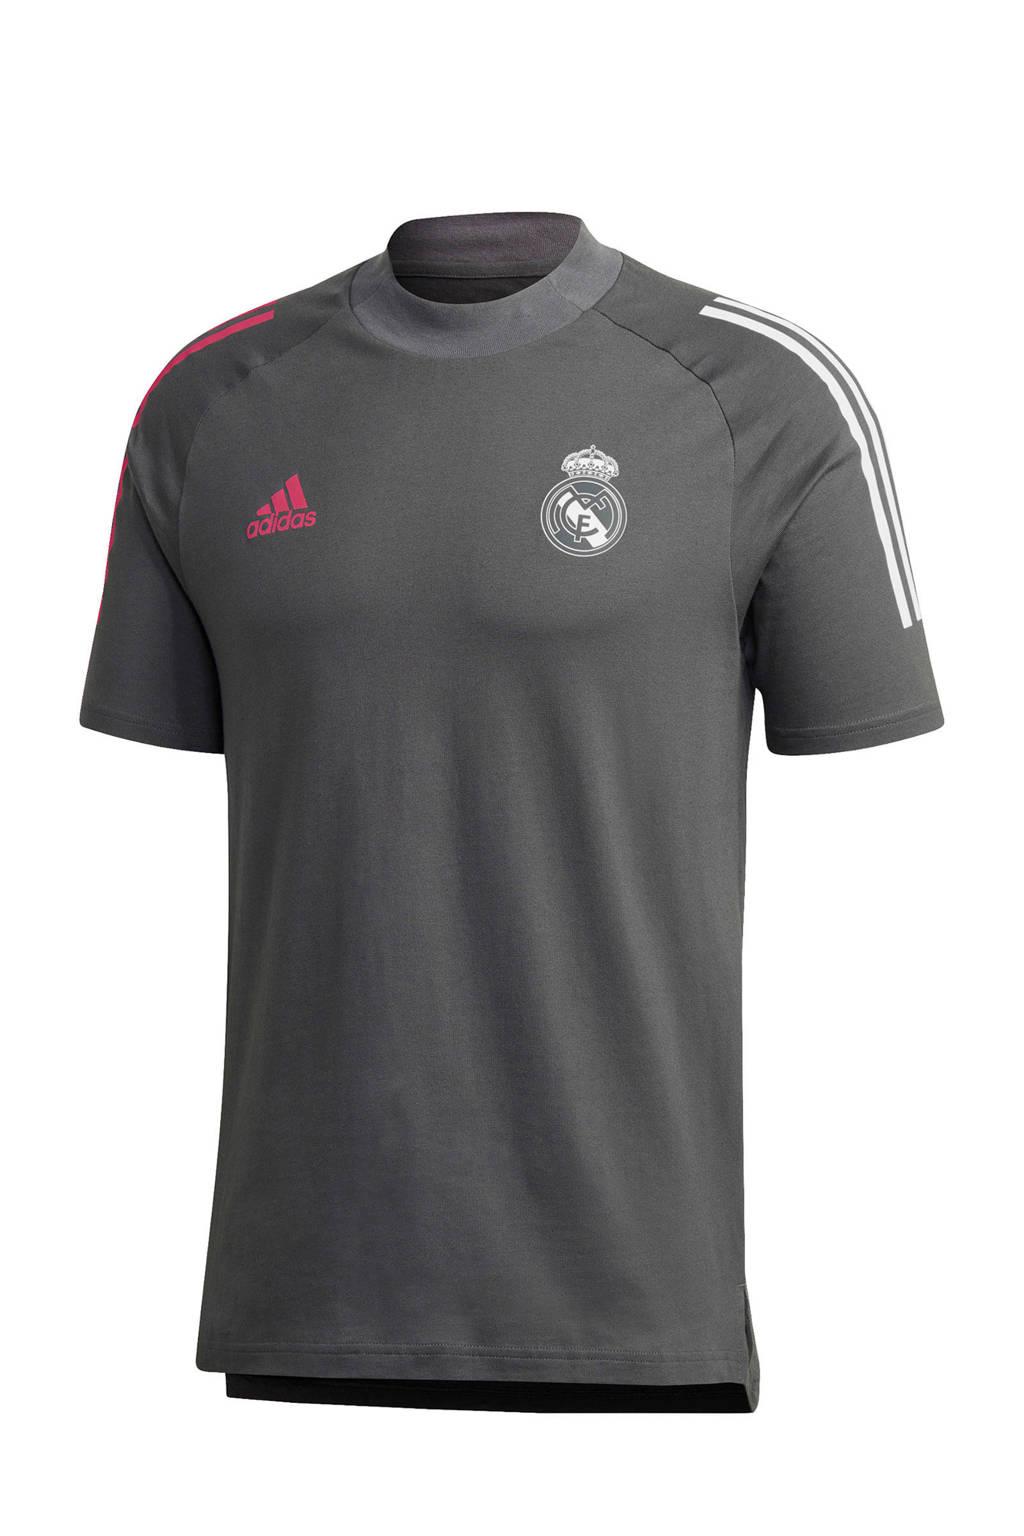 adidas Performance Senior Real Madrid voetbalshirt, Grijs